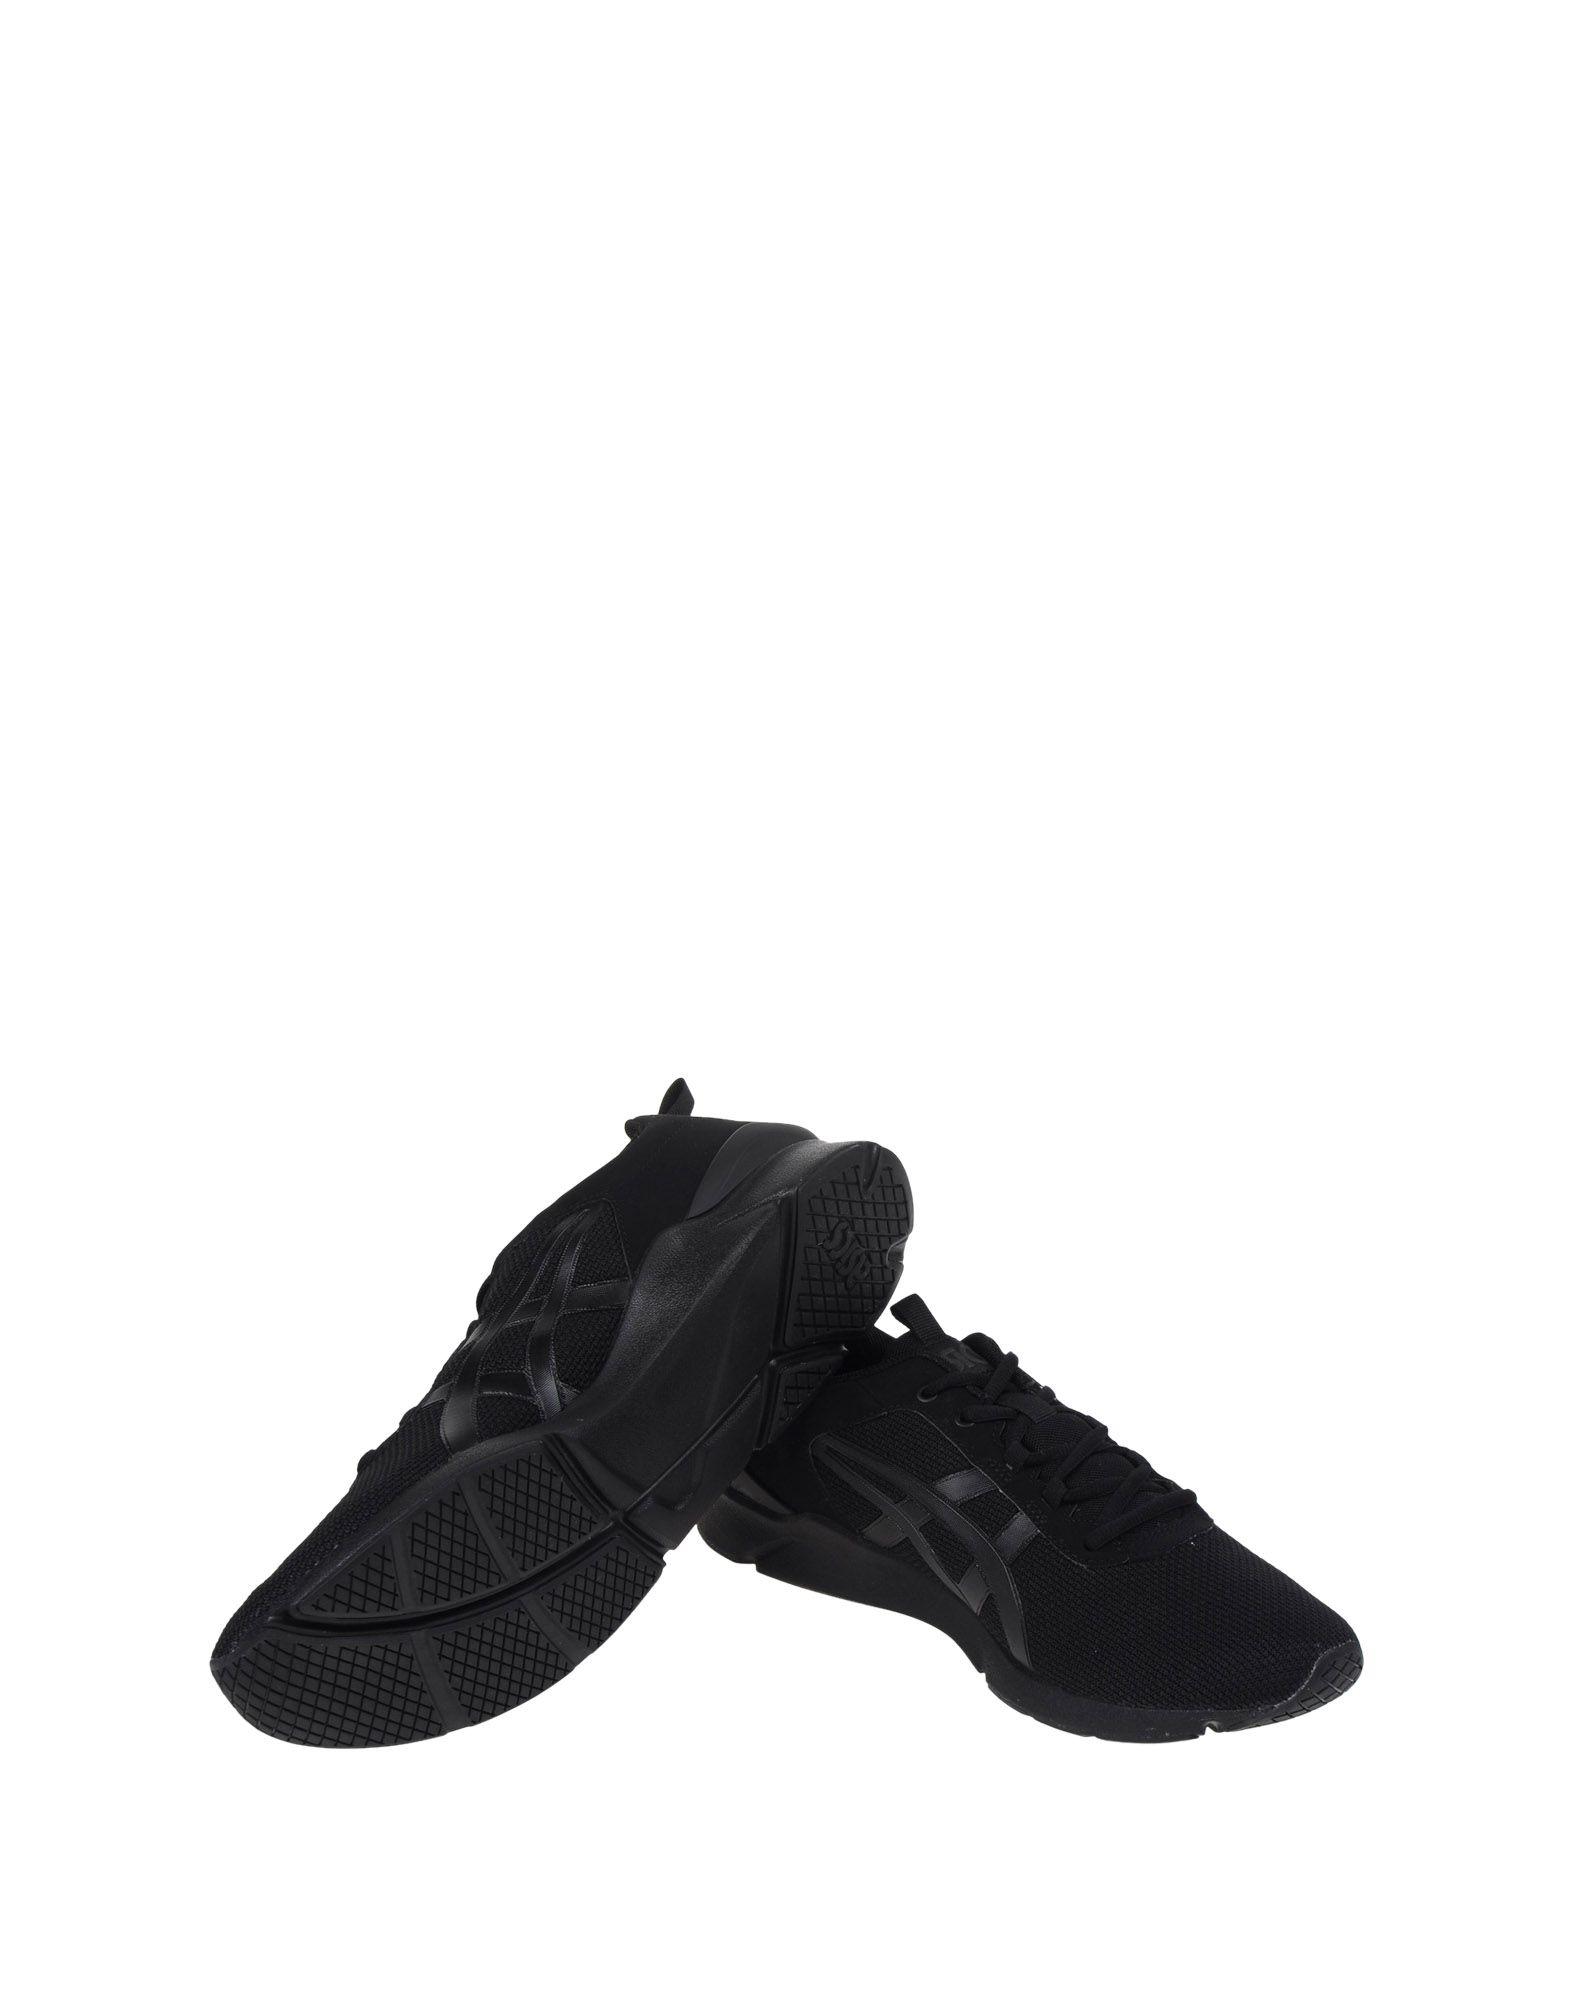 Sneakers Asics Tiger Gel-Lyte Runner - Homme - Sneakers Asics Tiger sur